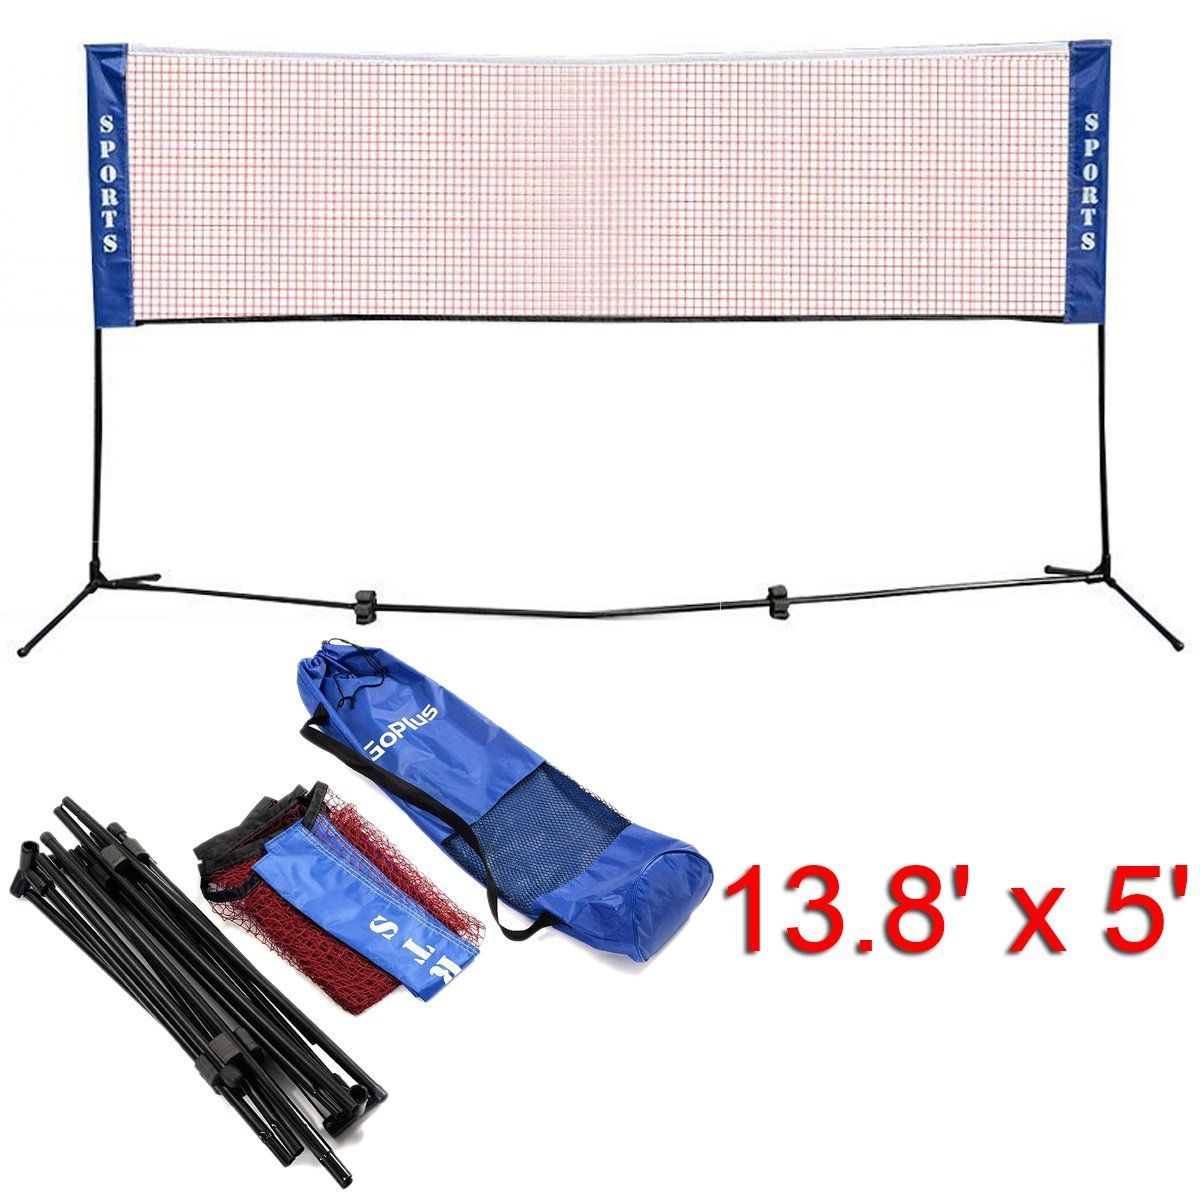 6 Goplus Portable Badminton Net Badminton Nets Badminton Tennis Nets